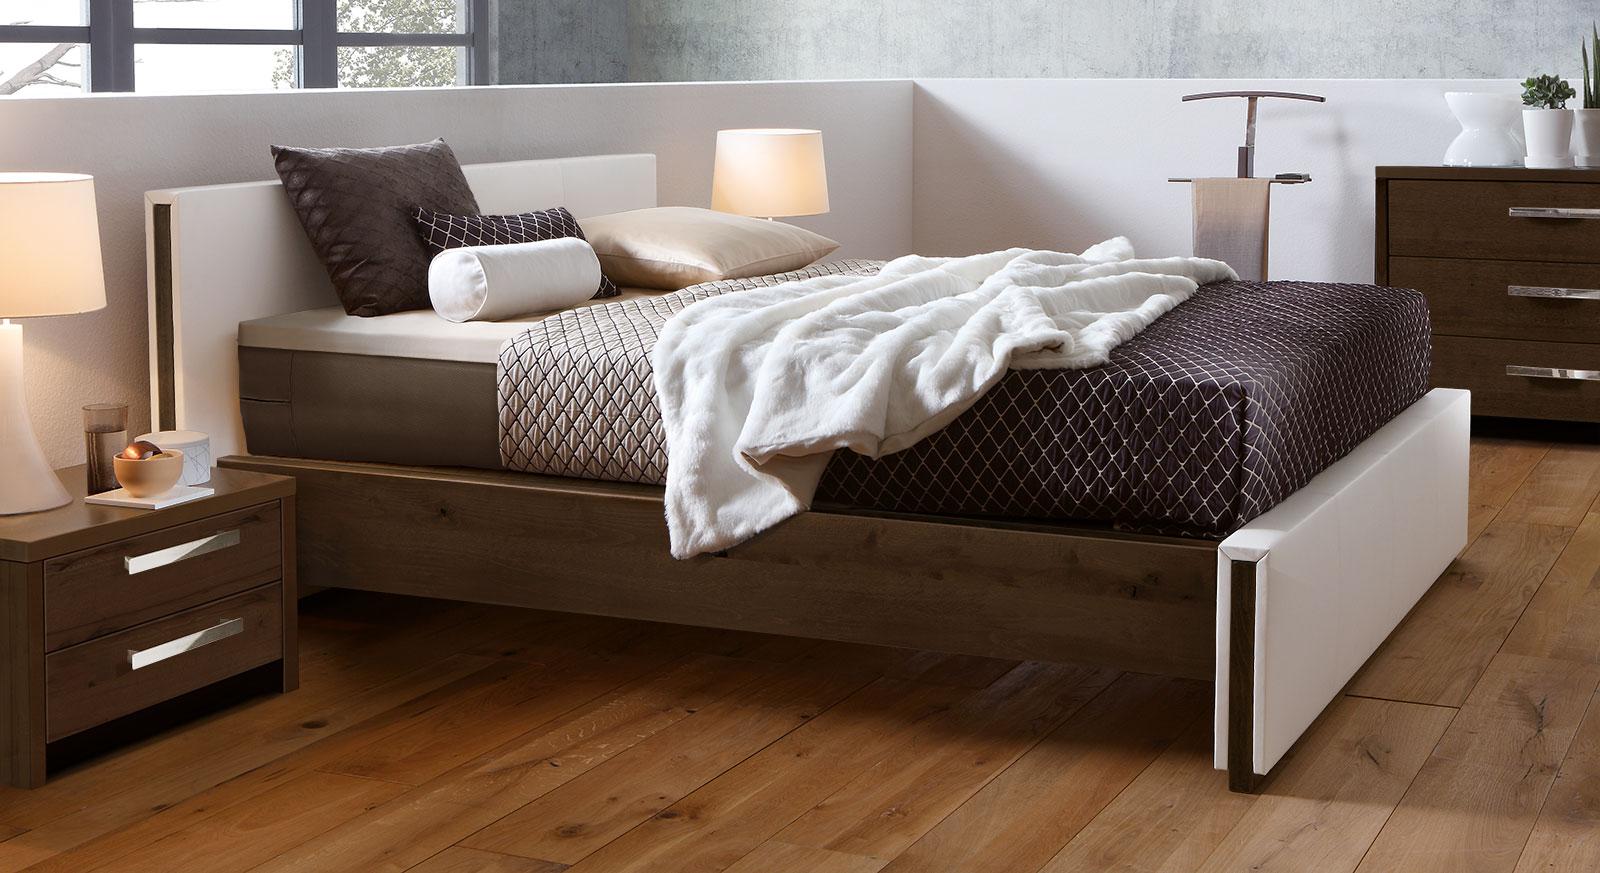 boxspringbett aus kunstleder und massivholz trient. Black Bedroom Furniture Sets. Home Design Ideas